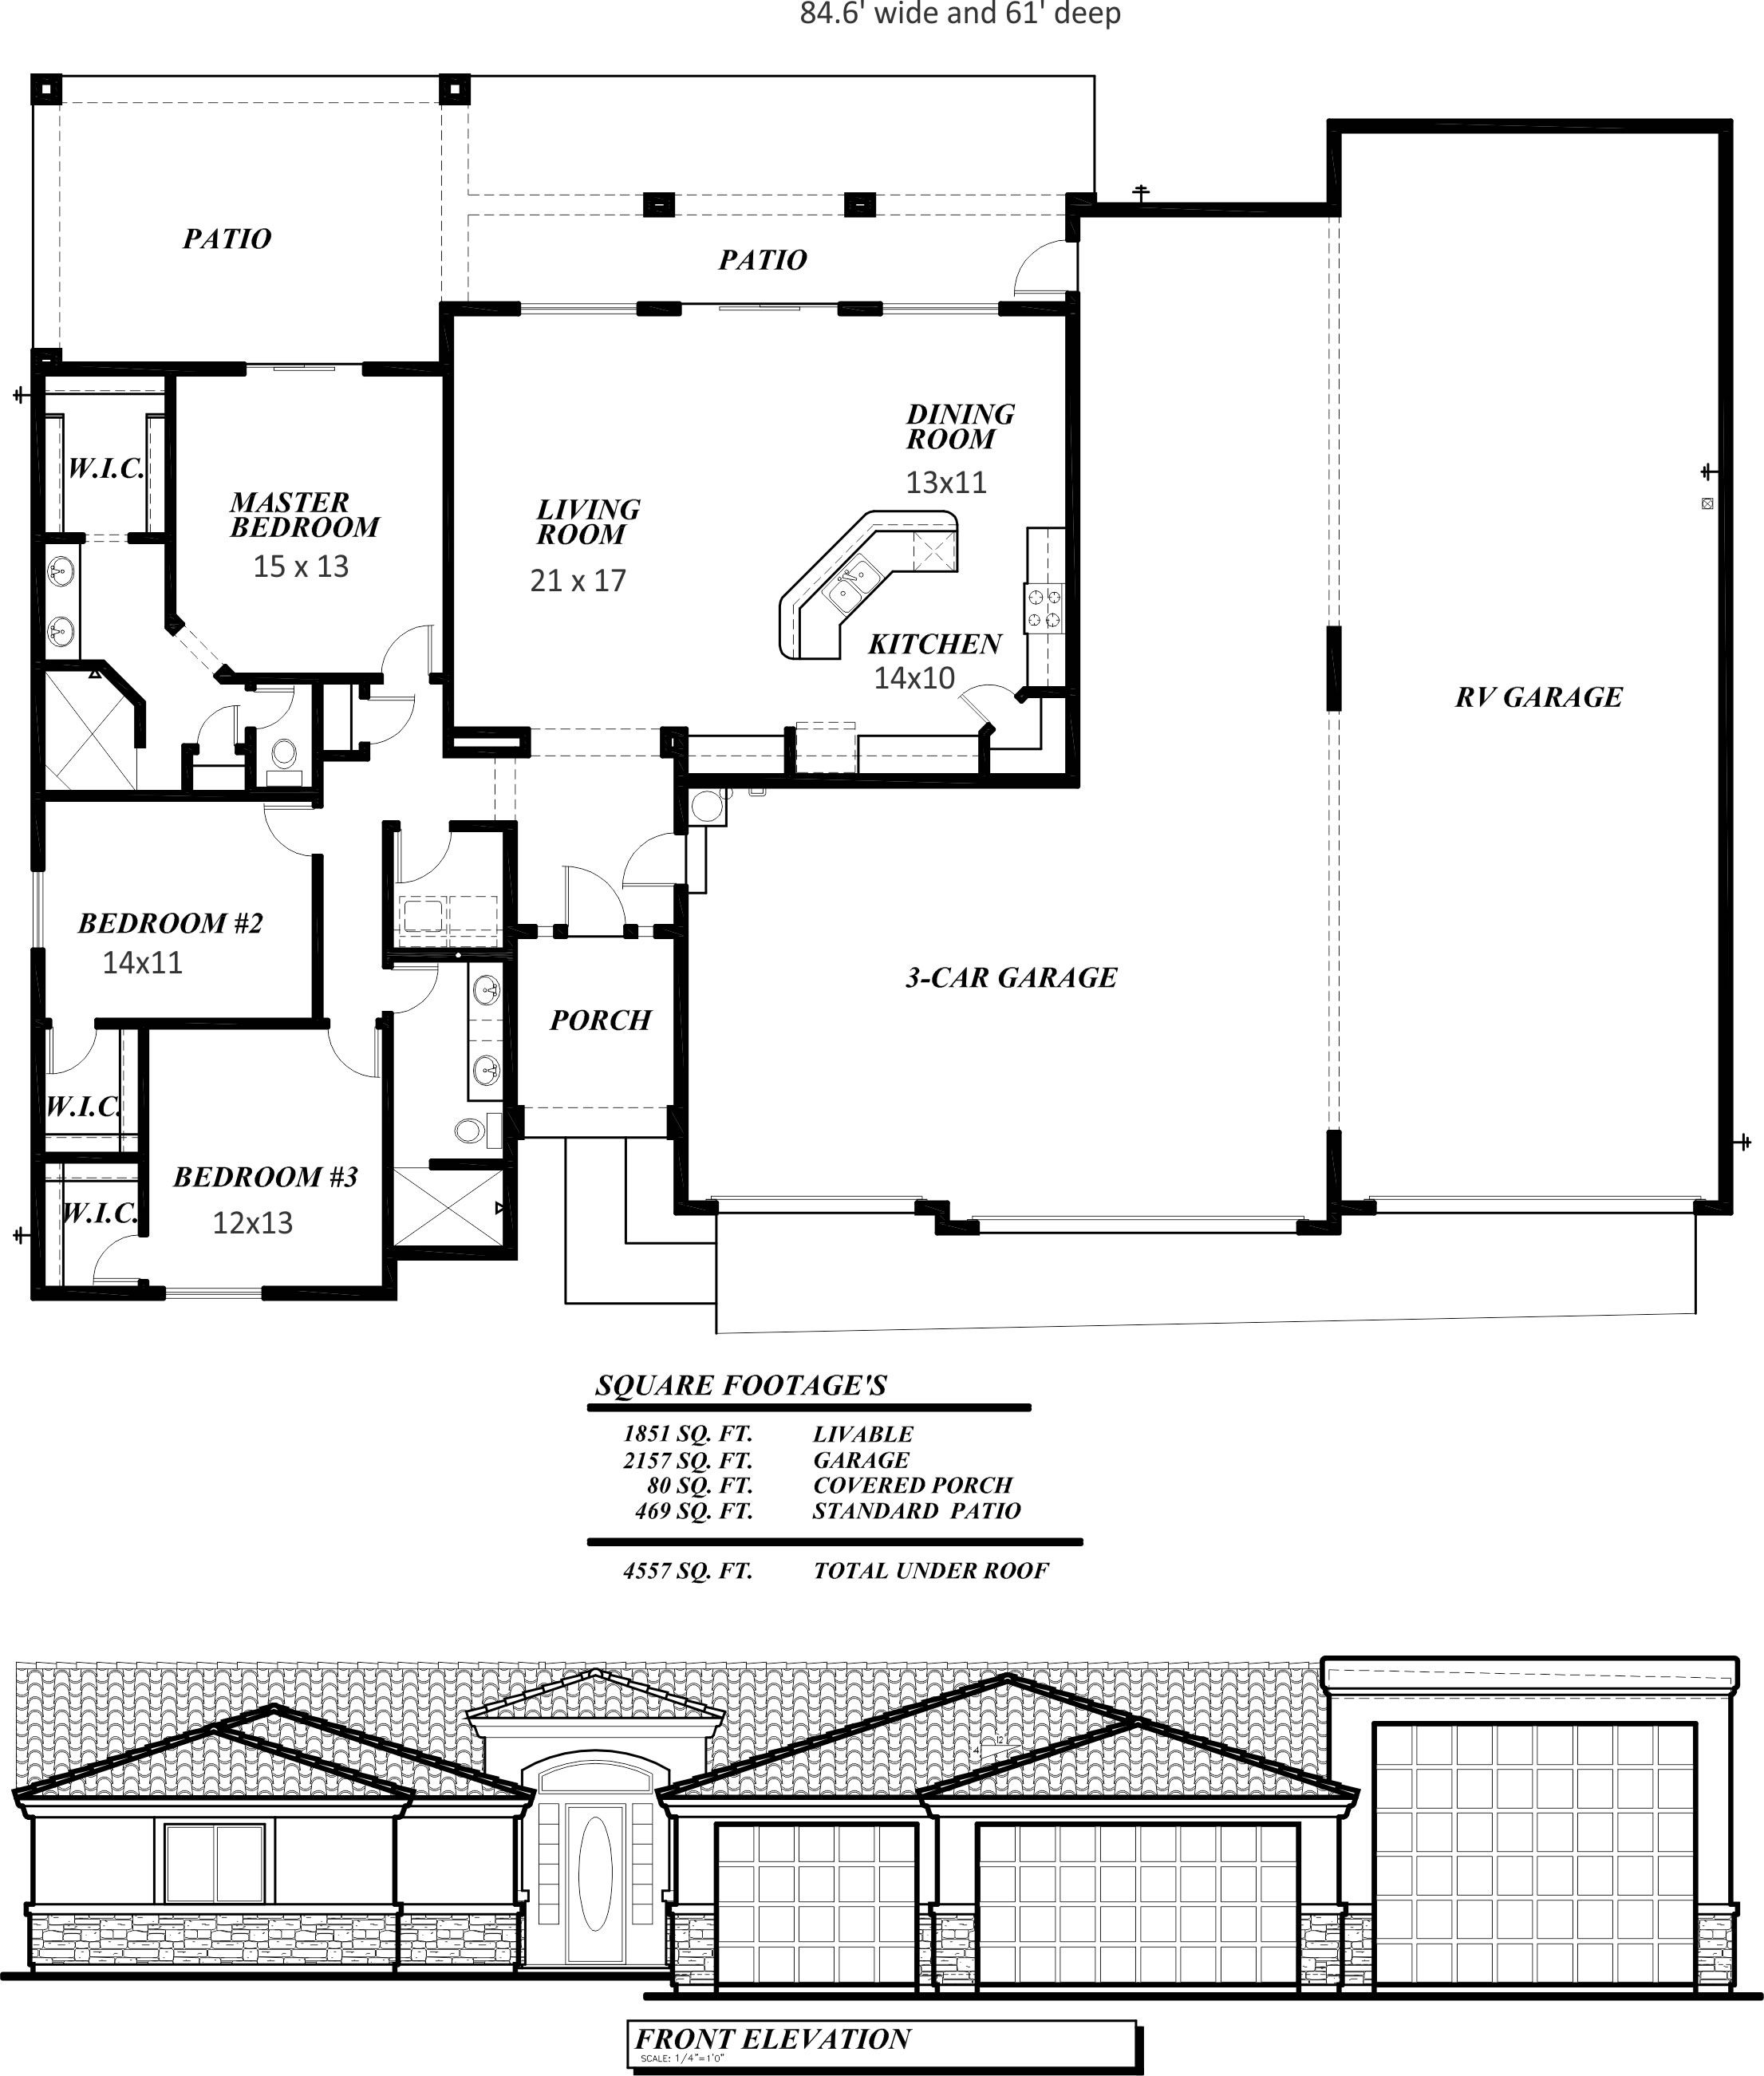 2730bambooflyerlg Jpg 2 211 2 602 Pixels Shed House Plans Garage House Plans Garage Floor Plans